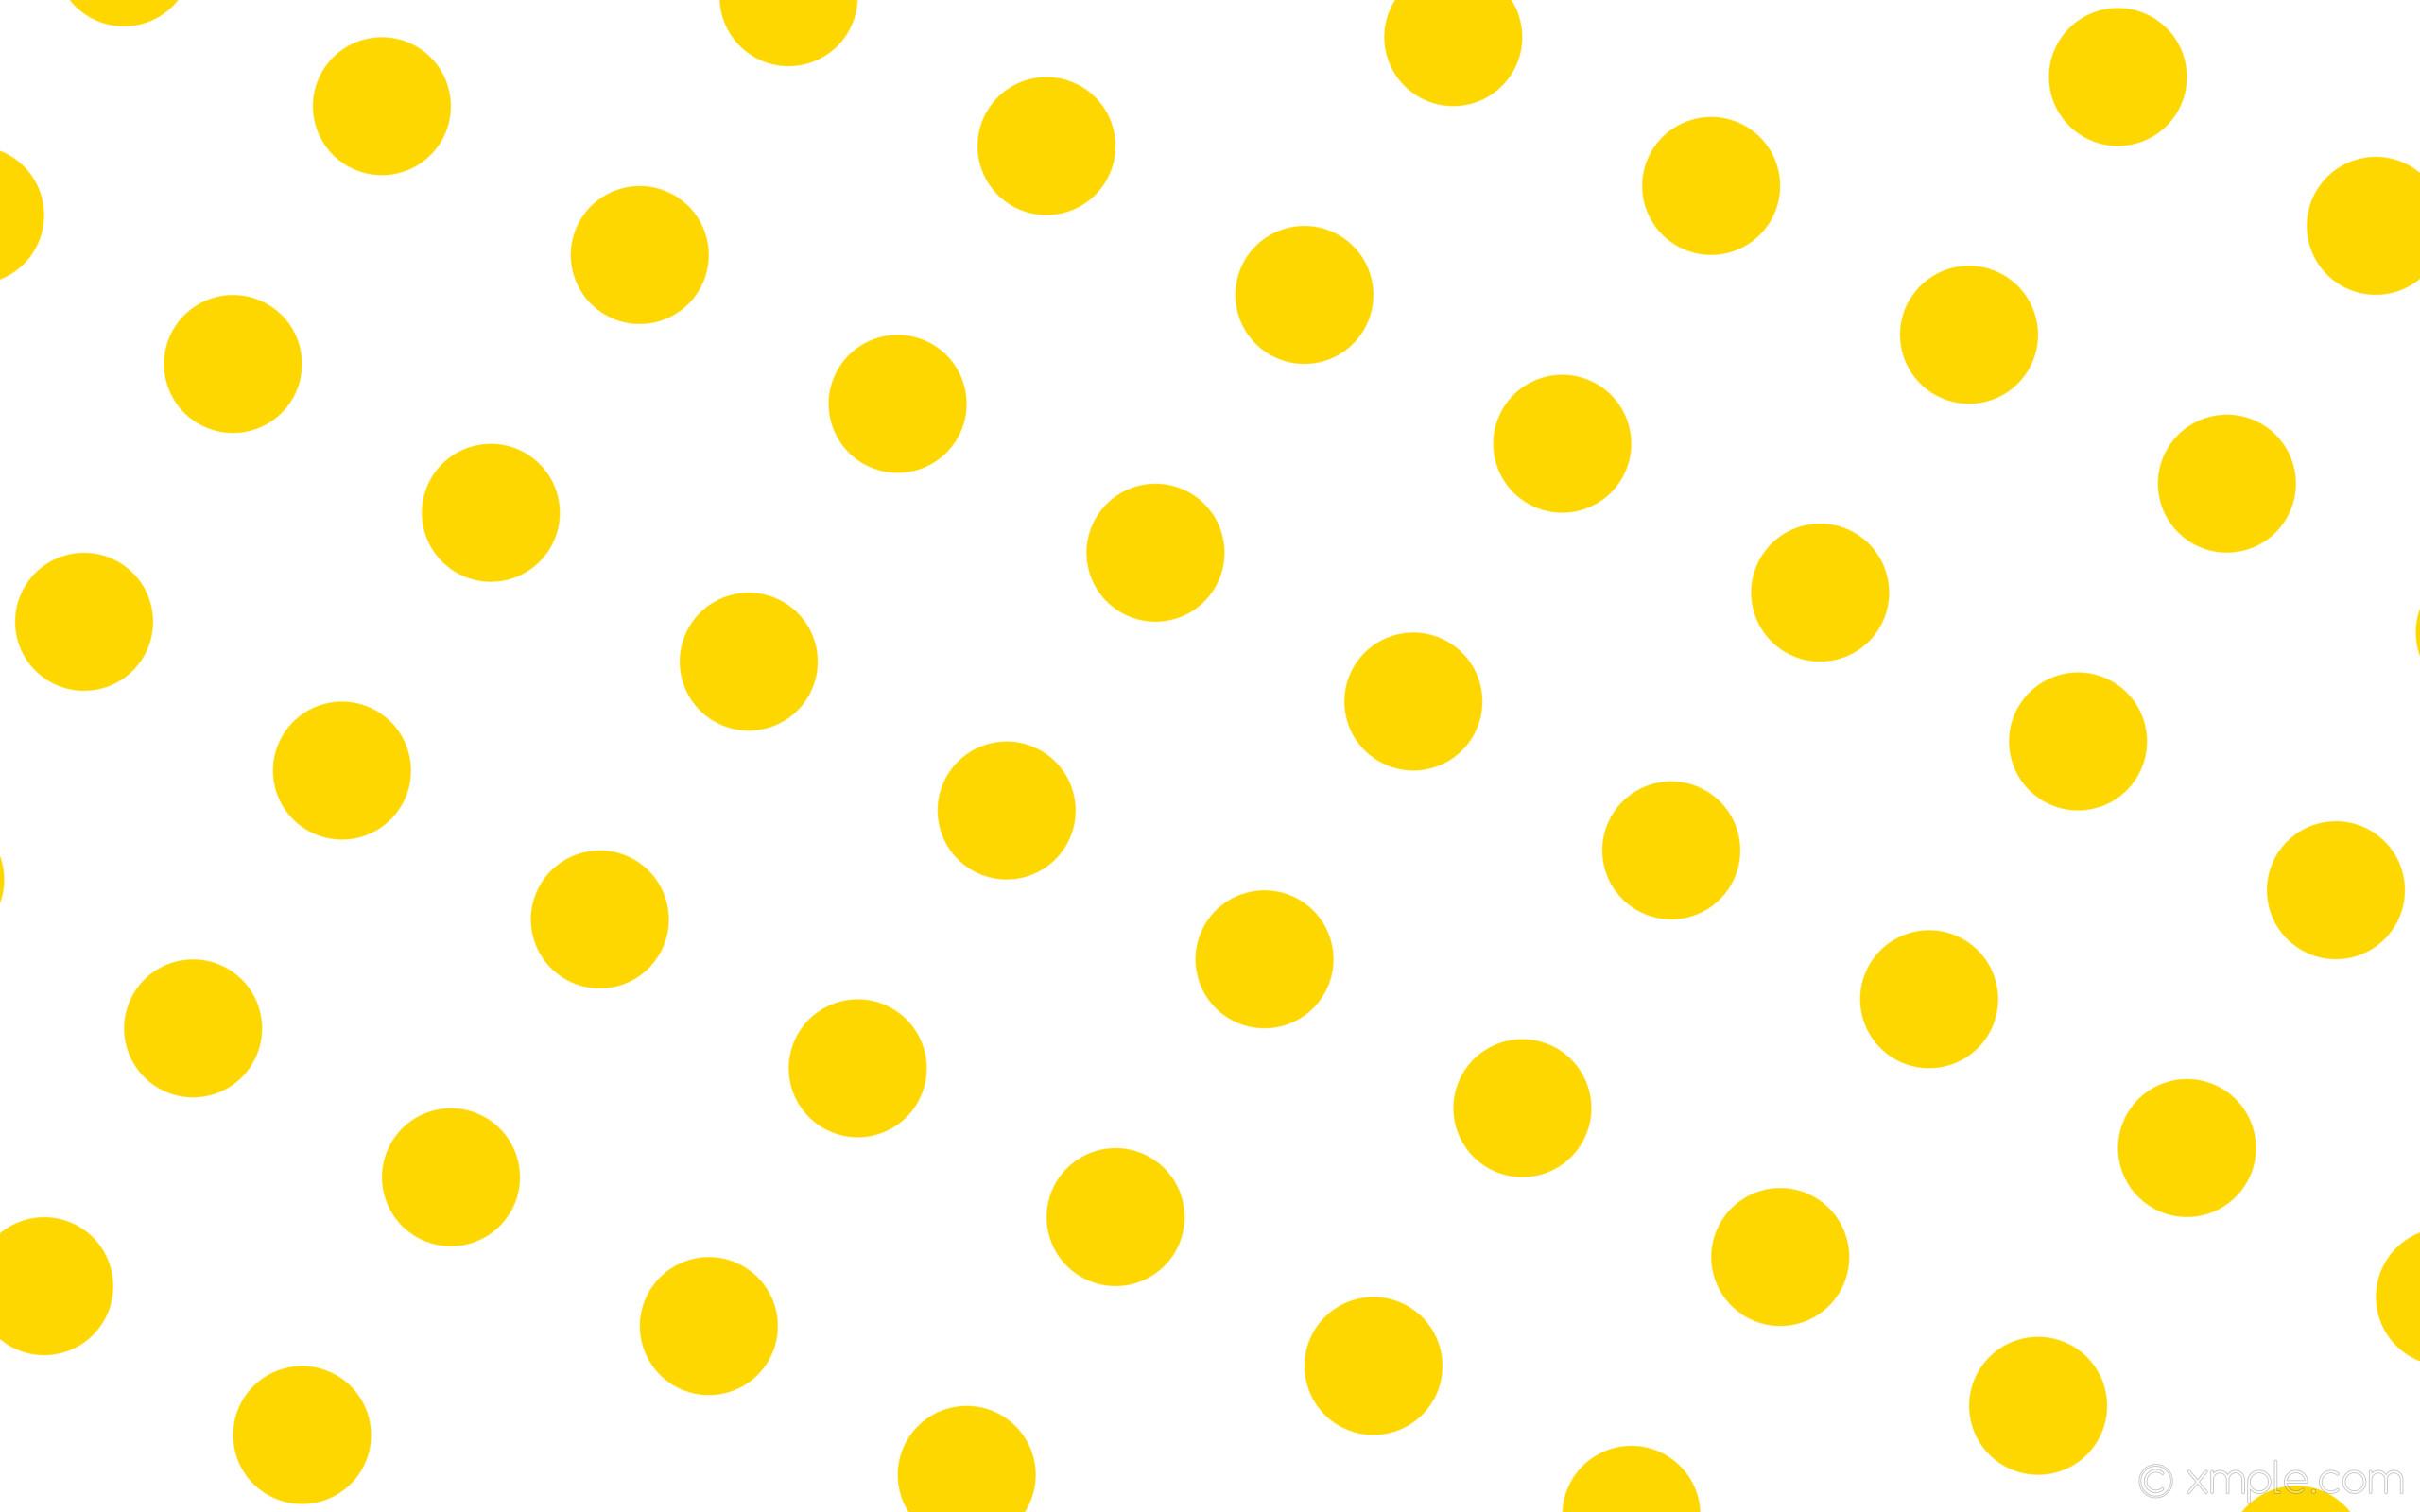 wallpaper white polka dots spots yellow gold #ffffff #ffd700 240° 146px  315px